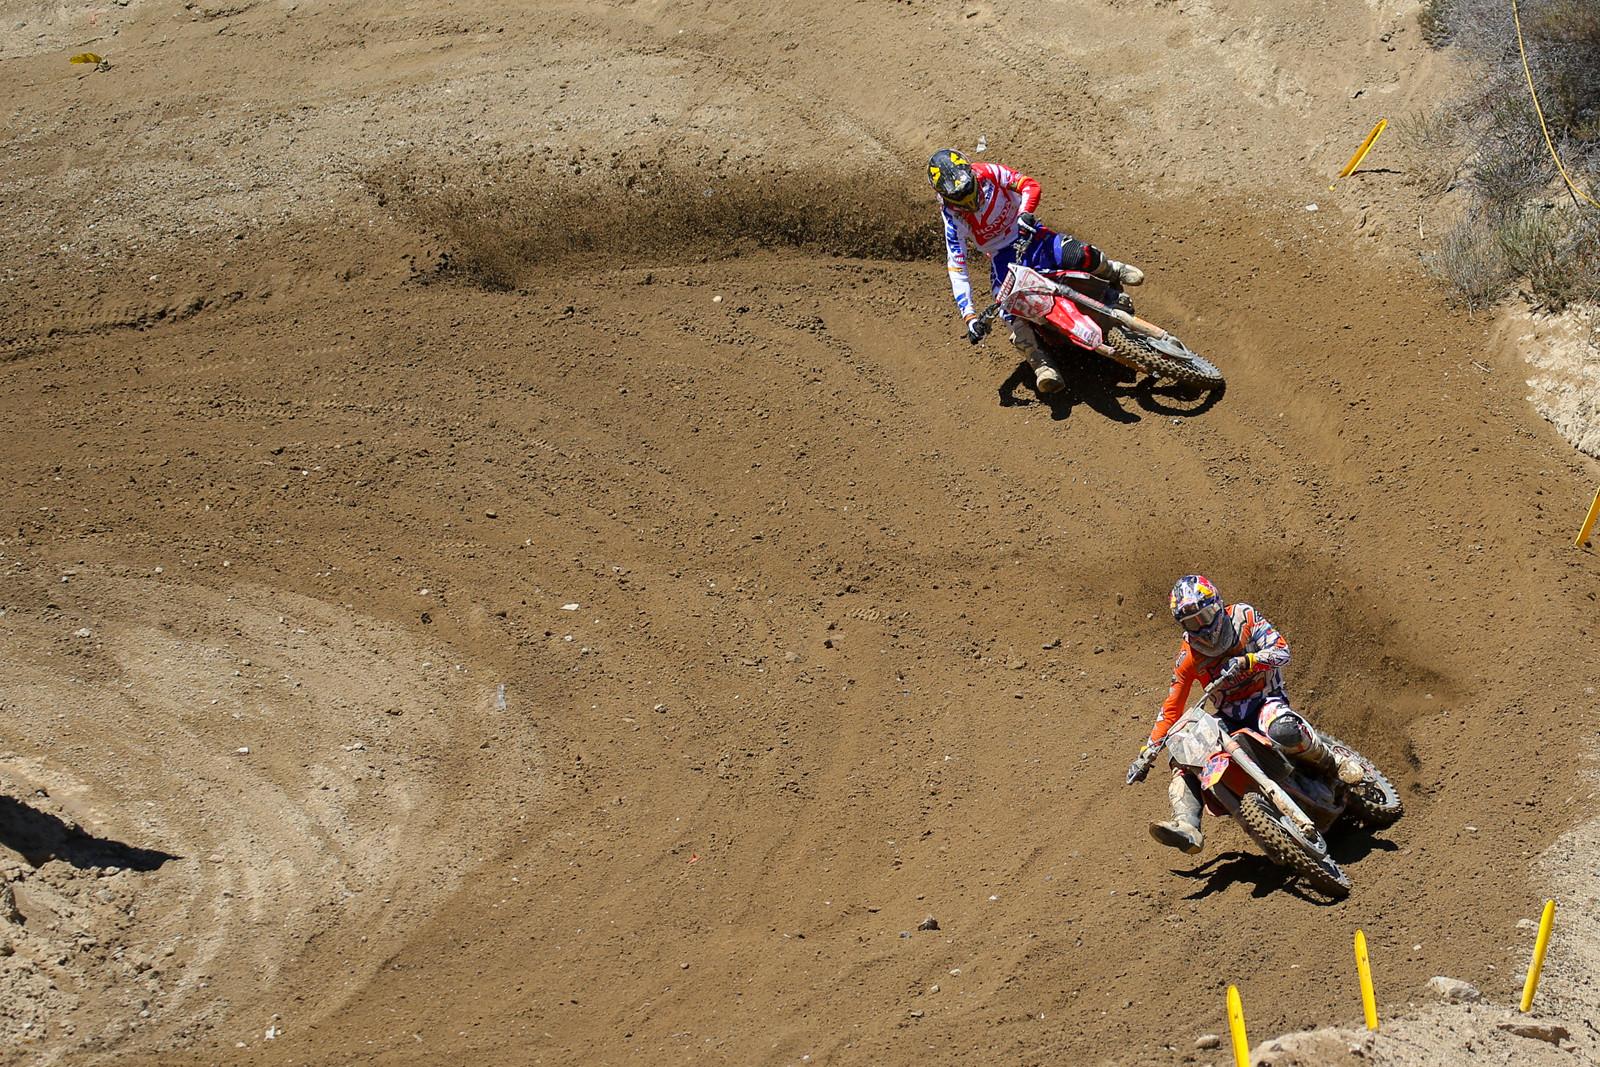 Pauls Jonass and Tim Gajser - Photo Blast: MXGP of the USA - Motocross Pictures - Vital MX